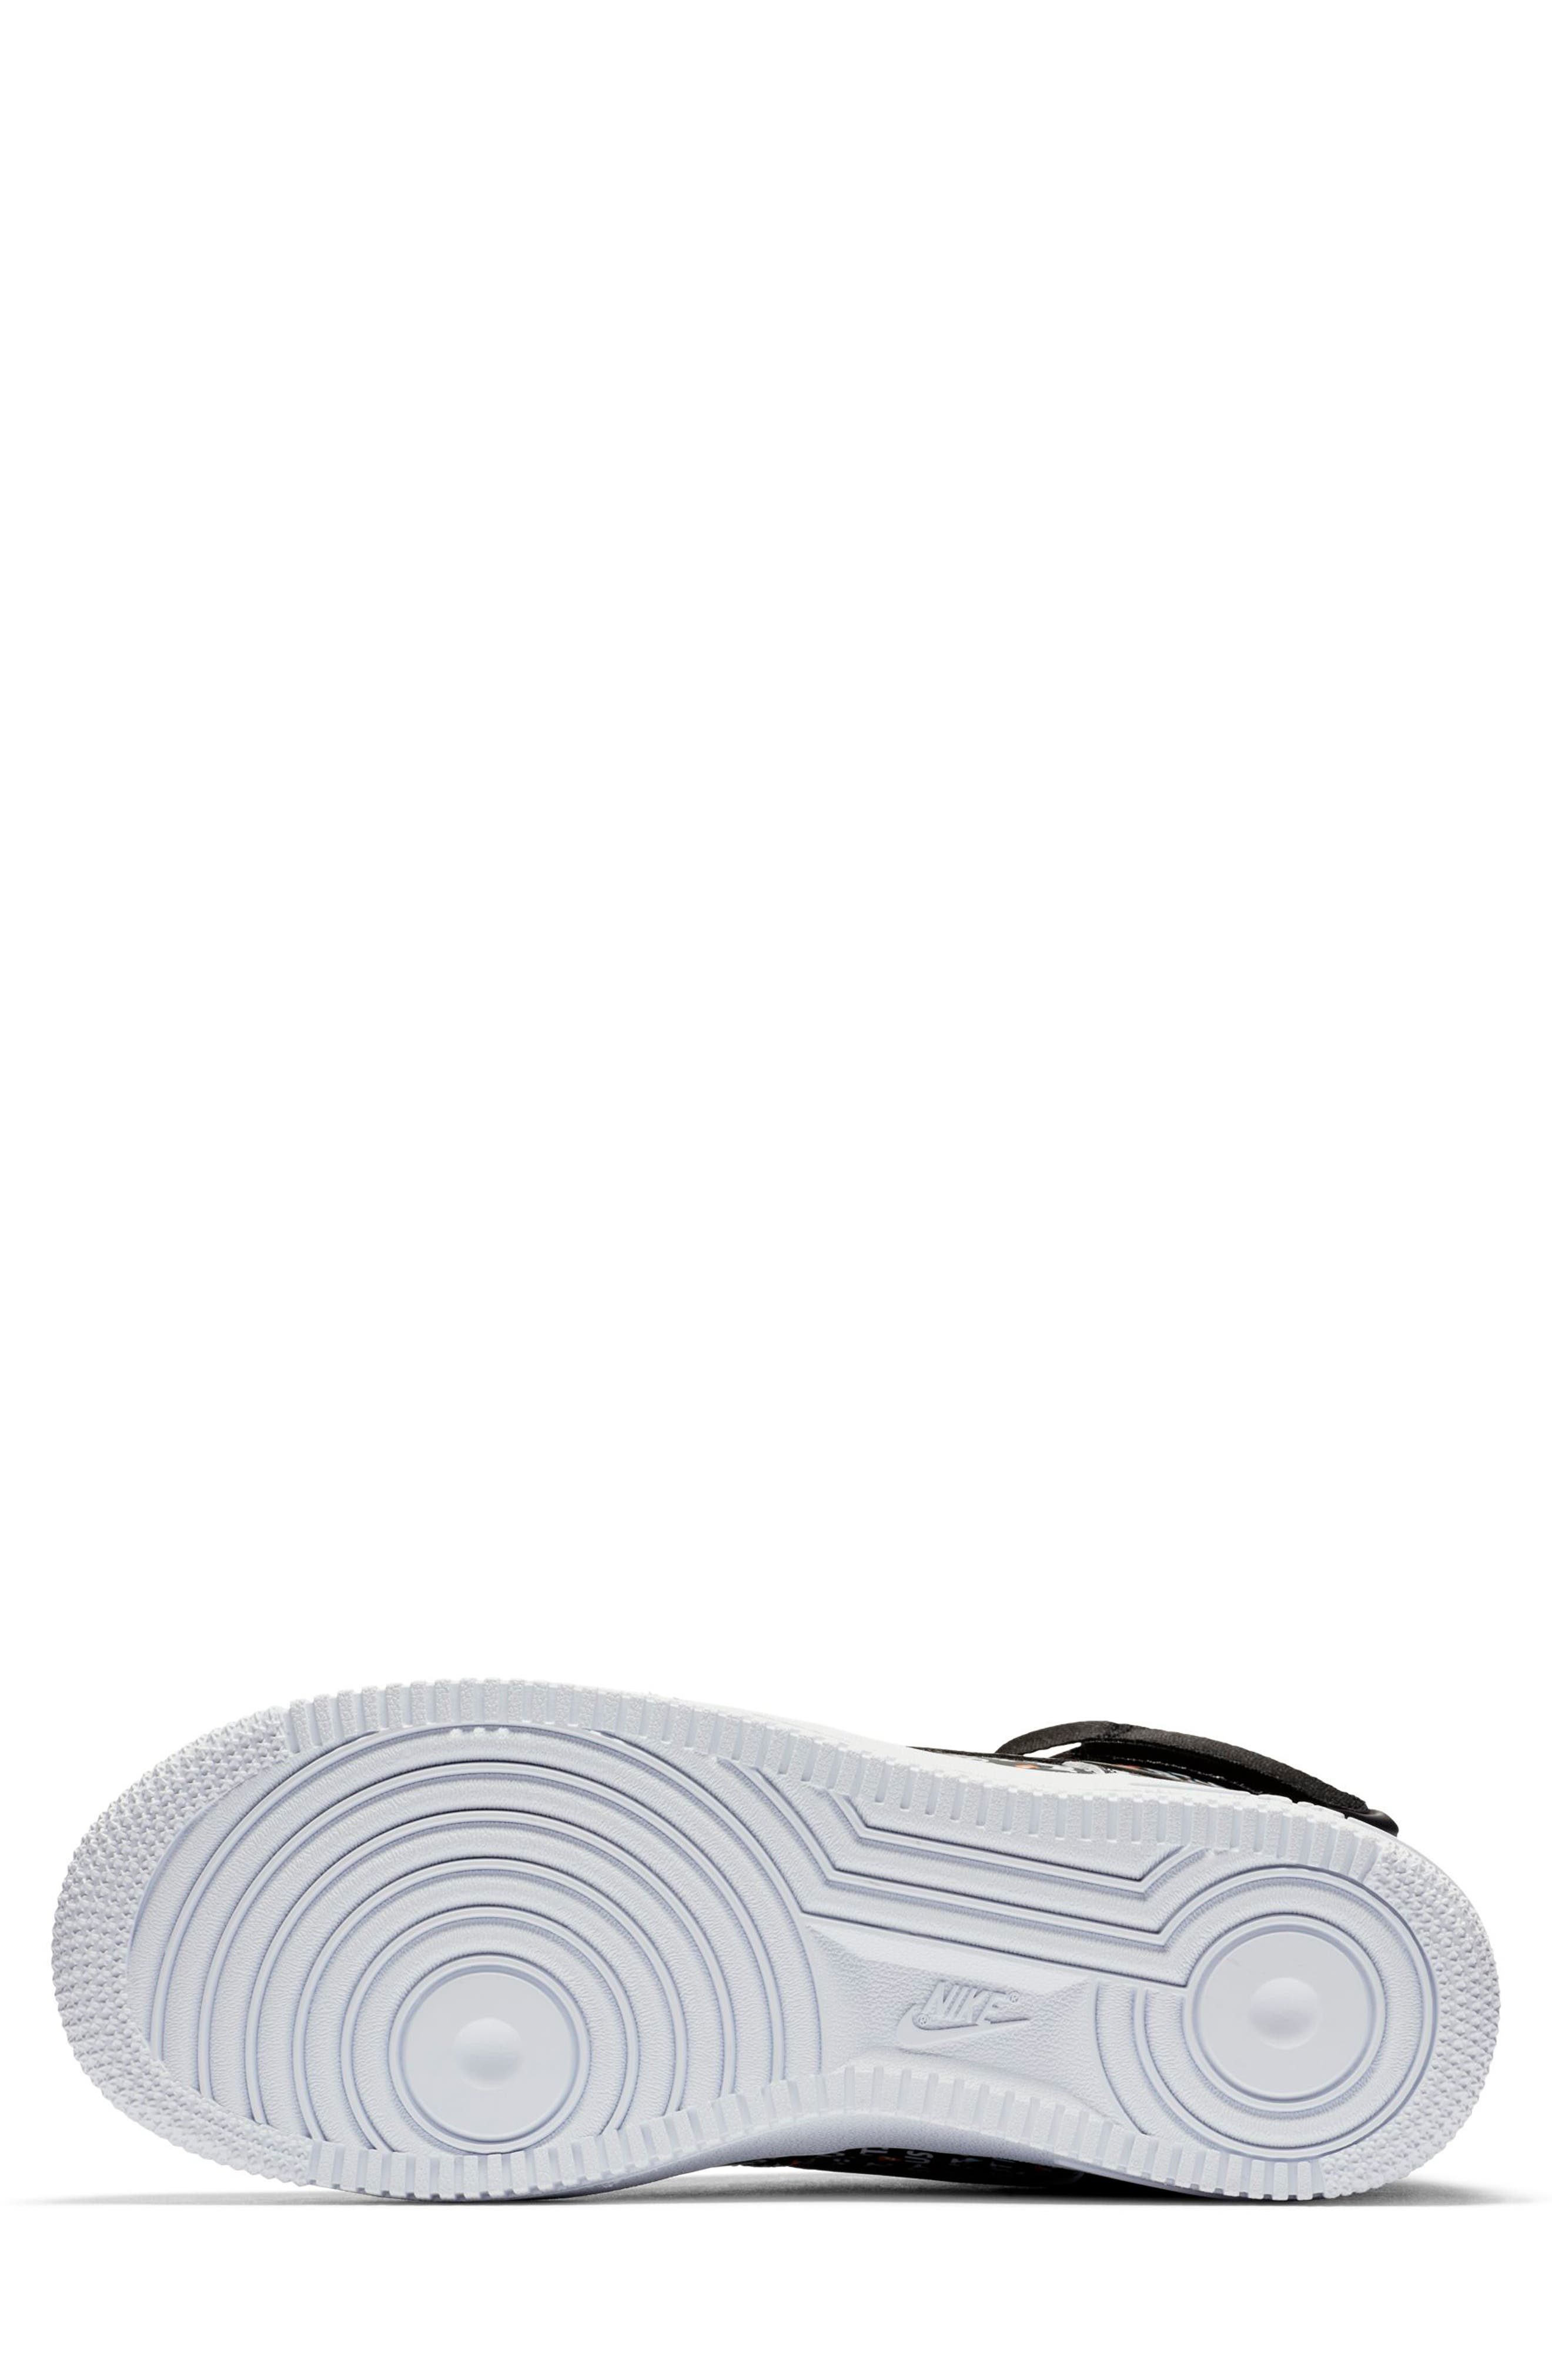 Air Force 1 High LX High Top Sneaker,                             Alternate thumbnail 5, color,                             BLACK